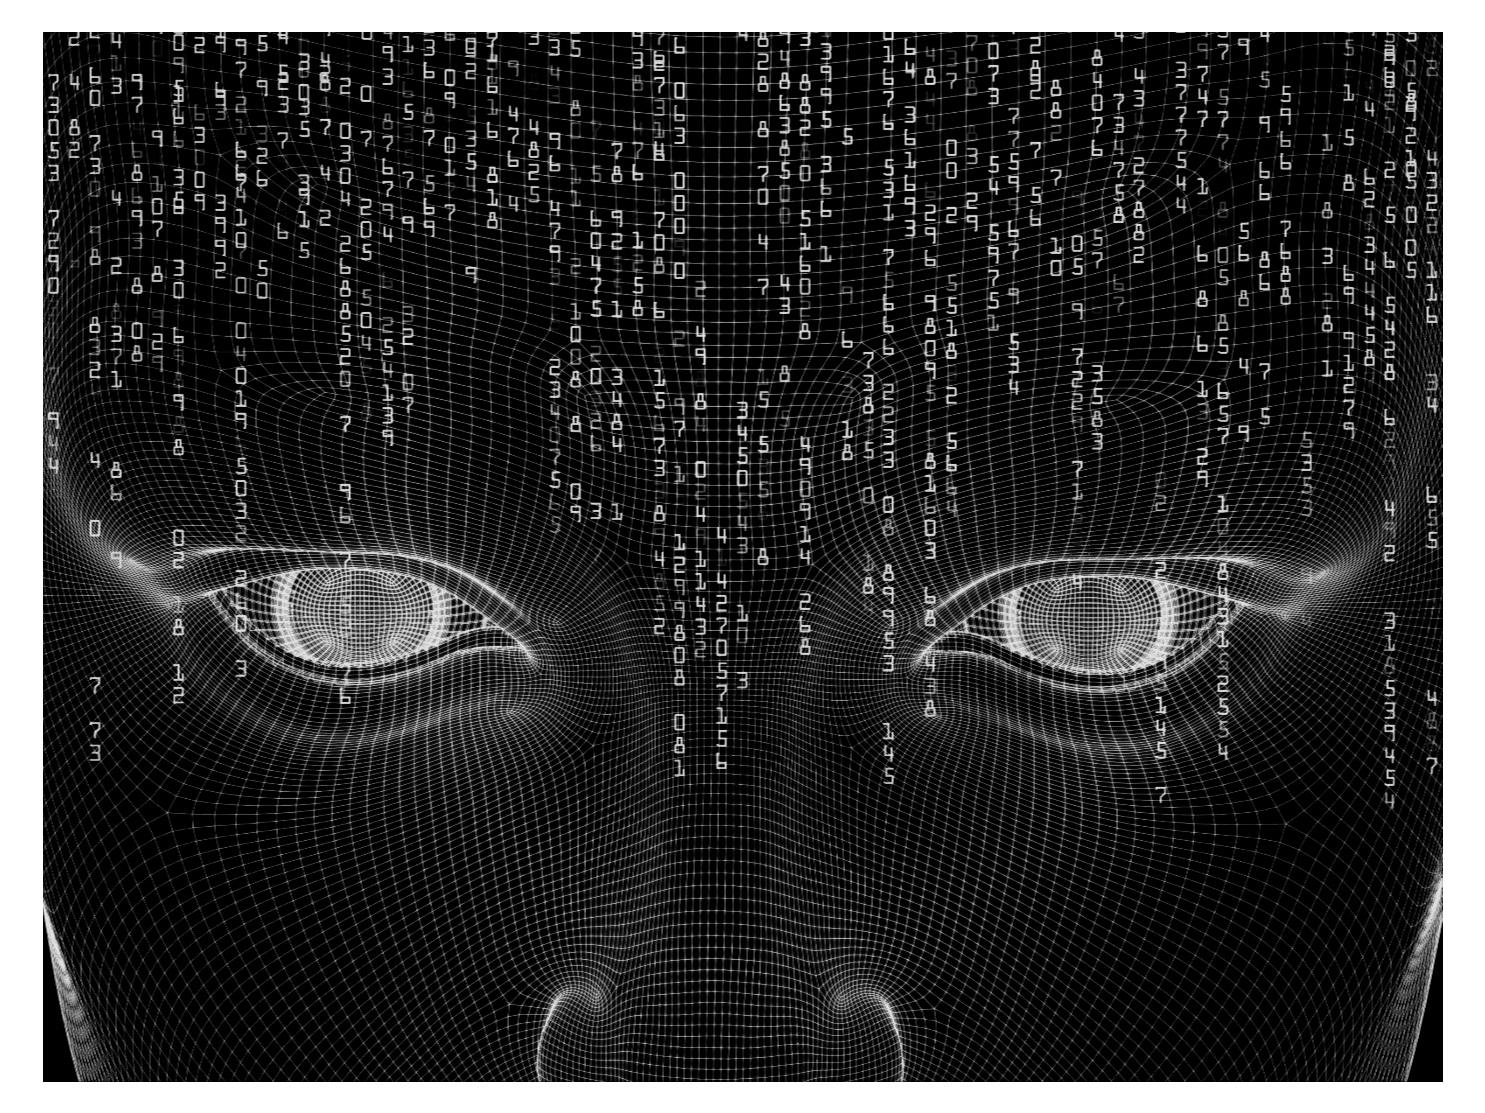 artificial_intelligence_benefits_risk.jpg